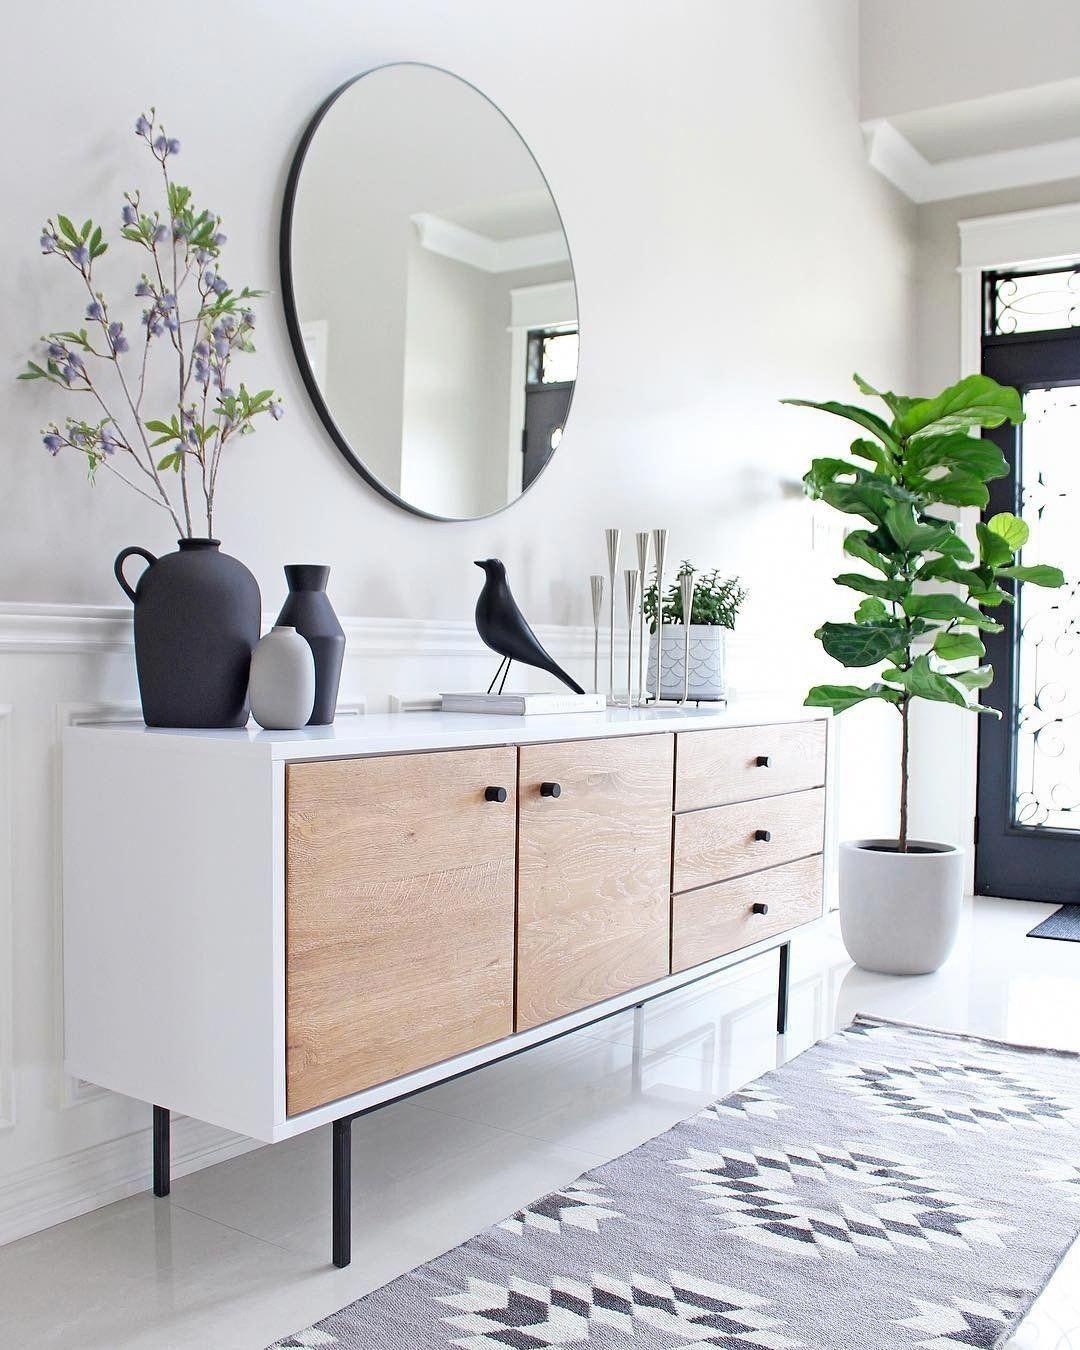 Cheap Home Decor - SalePrice:26$